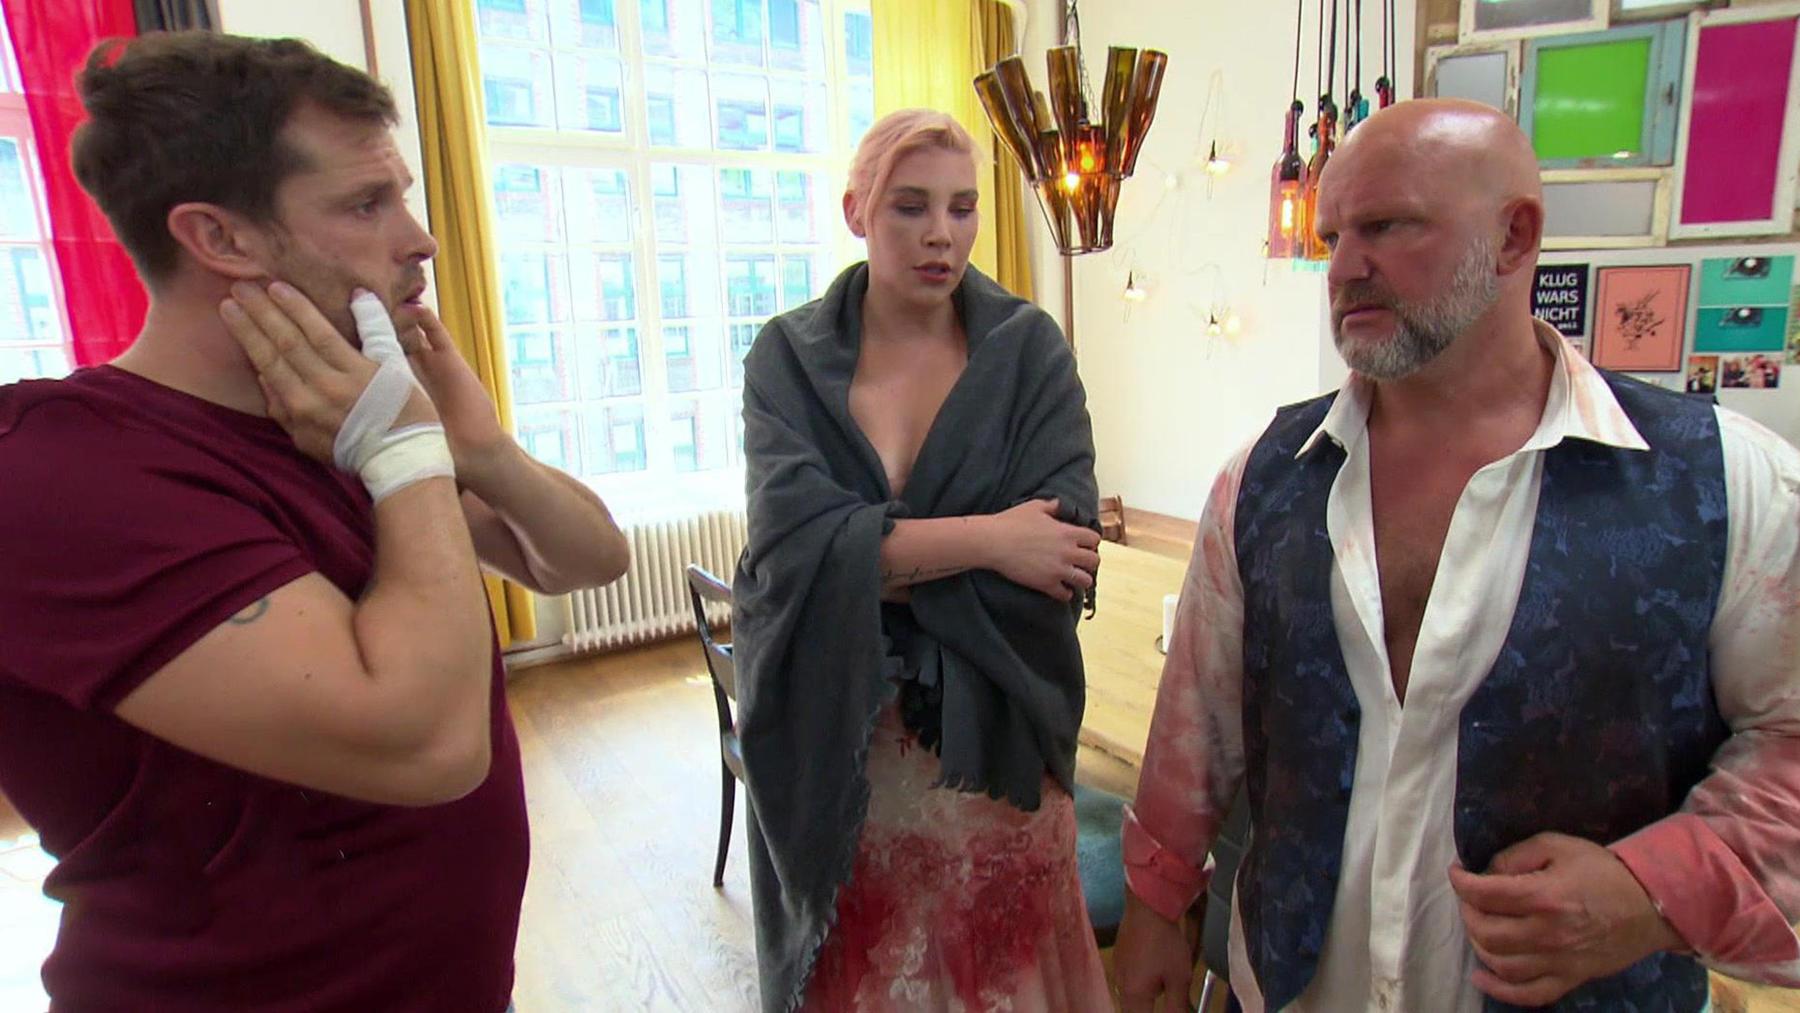 Berlin - Tag & Nacht (Folge 2530) | Folge 2530